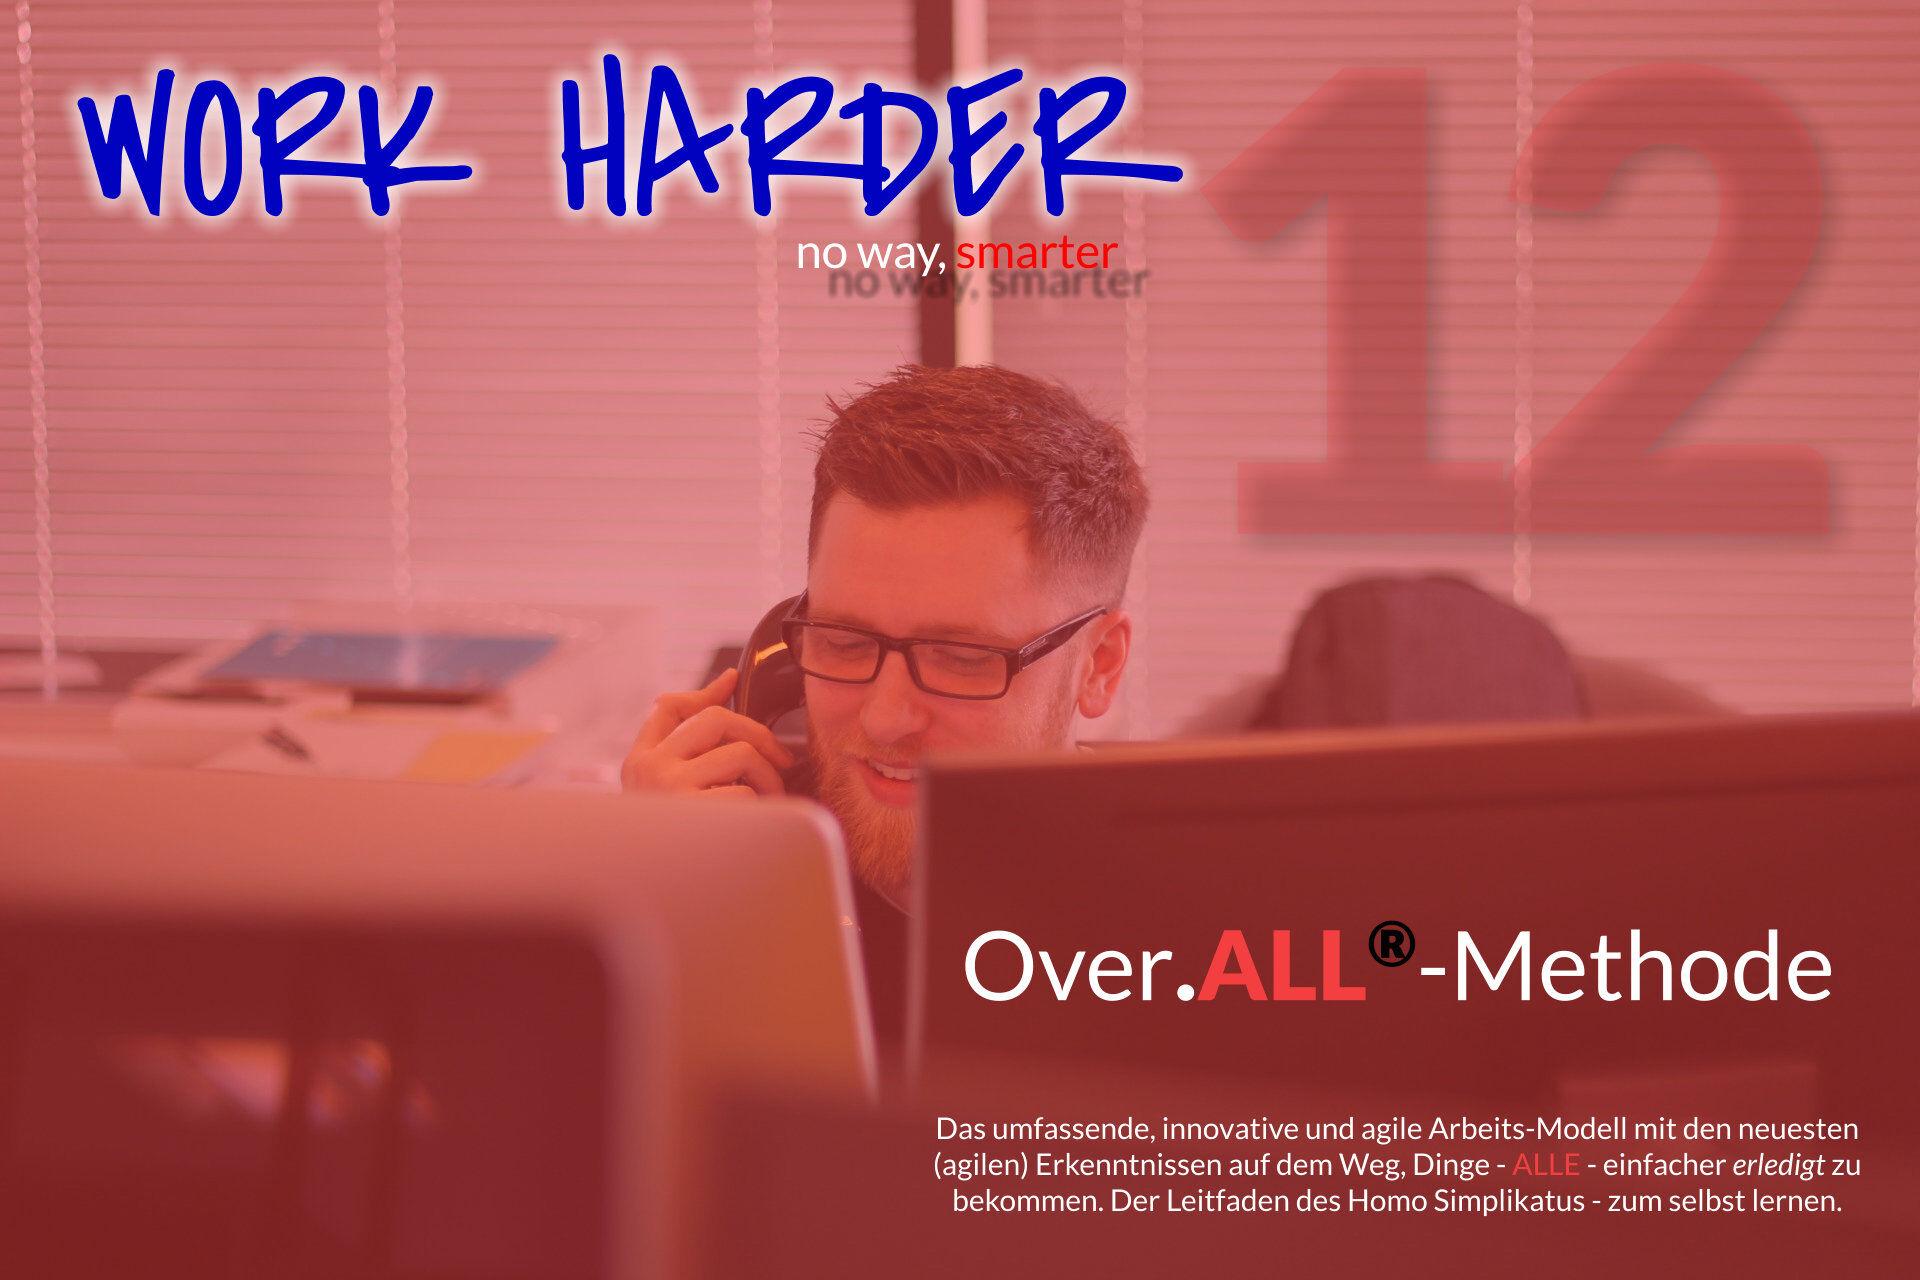 Work Harder Titel Series Over.ALL-Methode Blog Series Titel 12